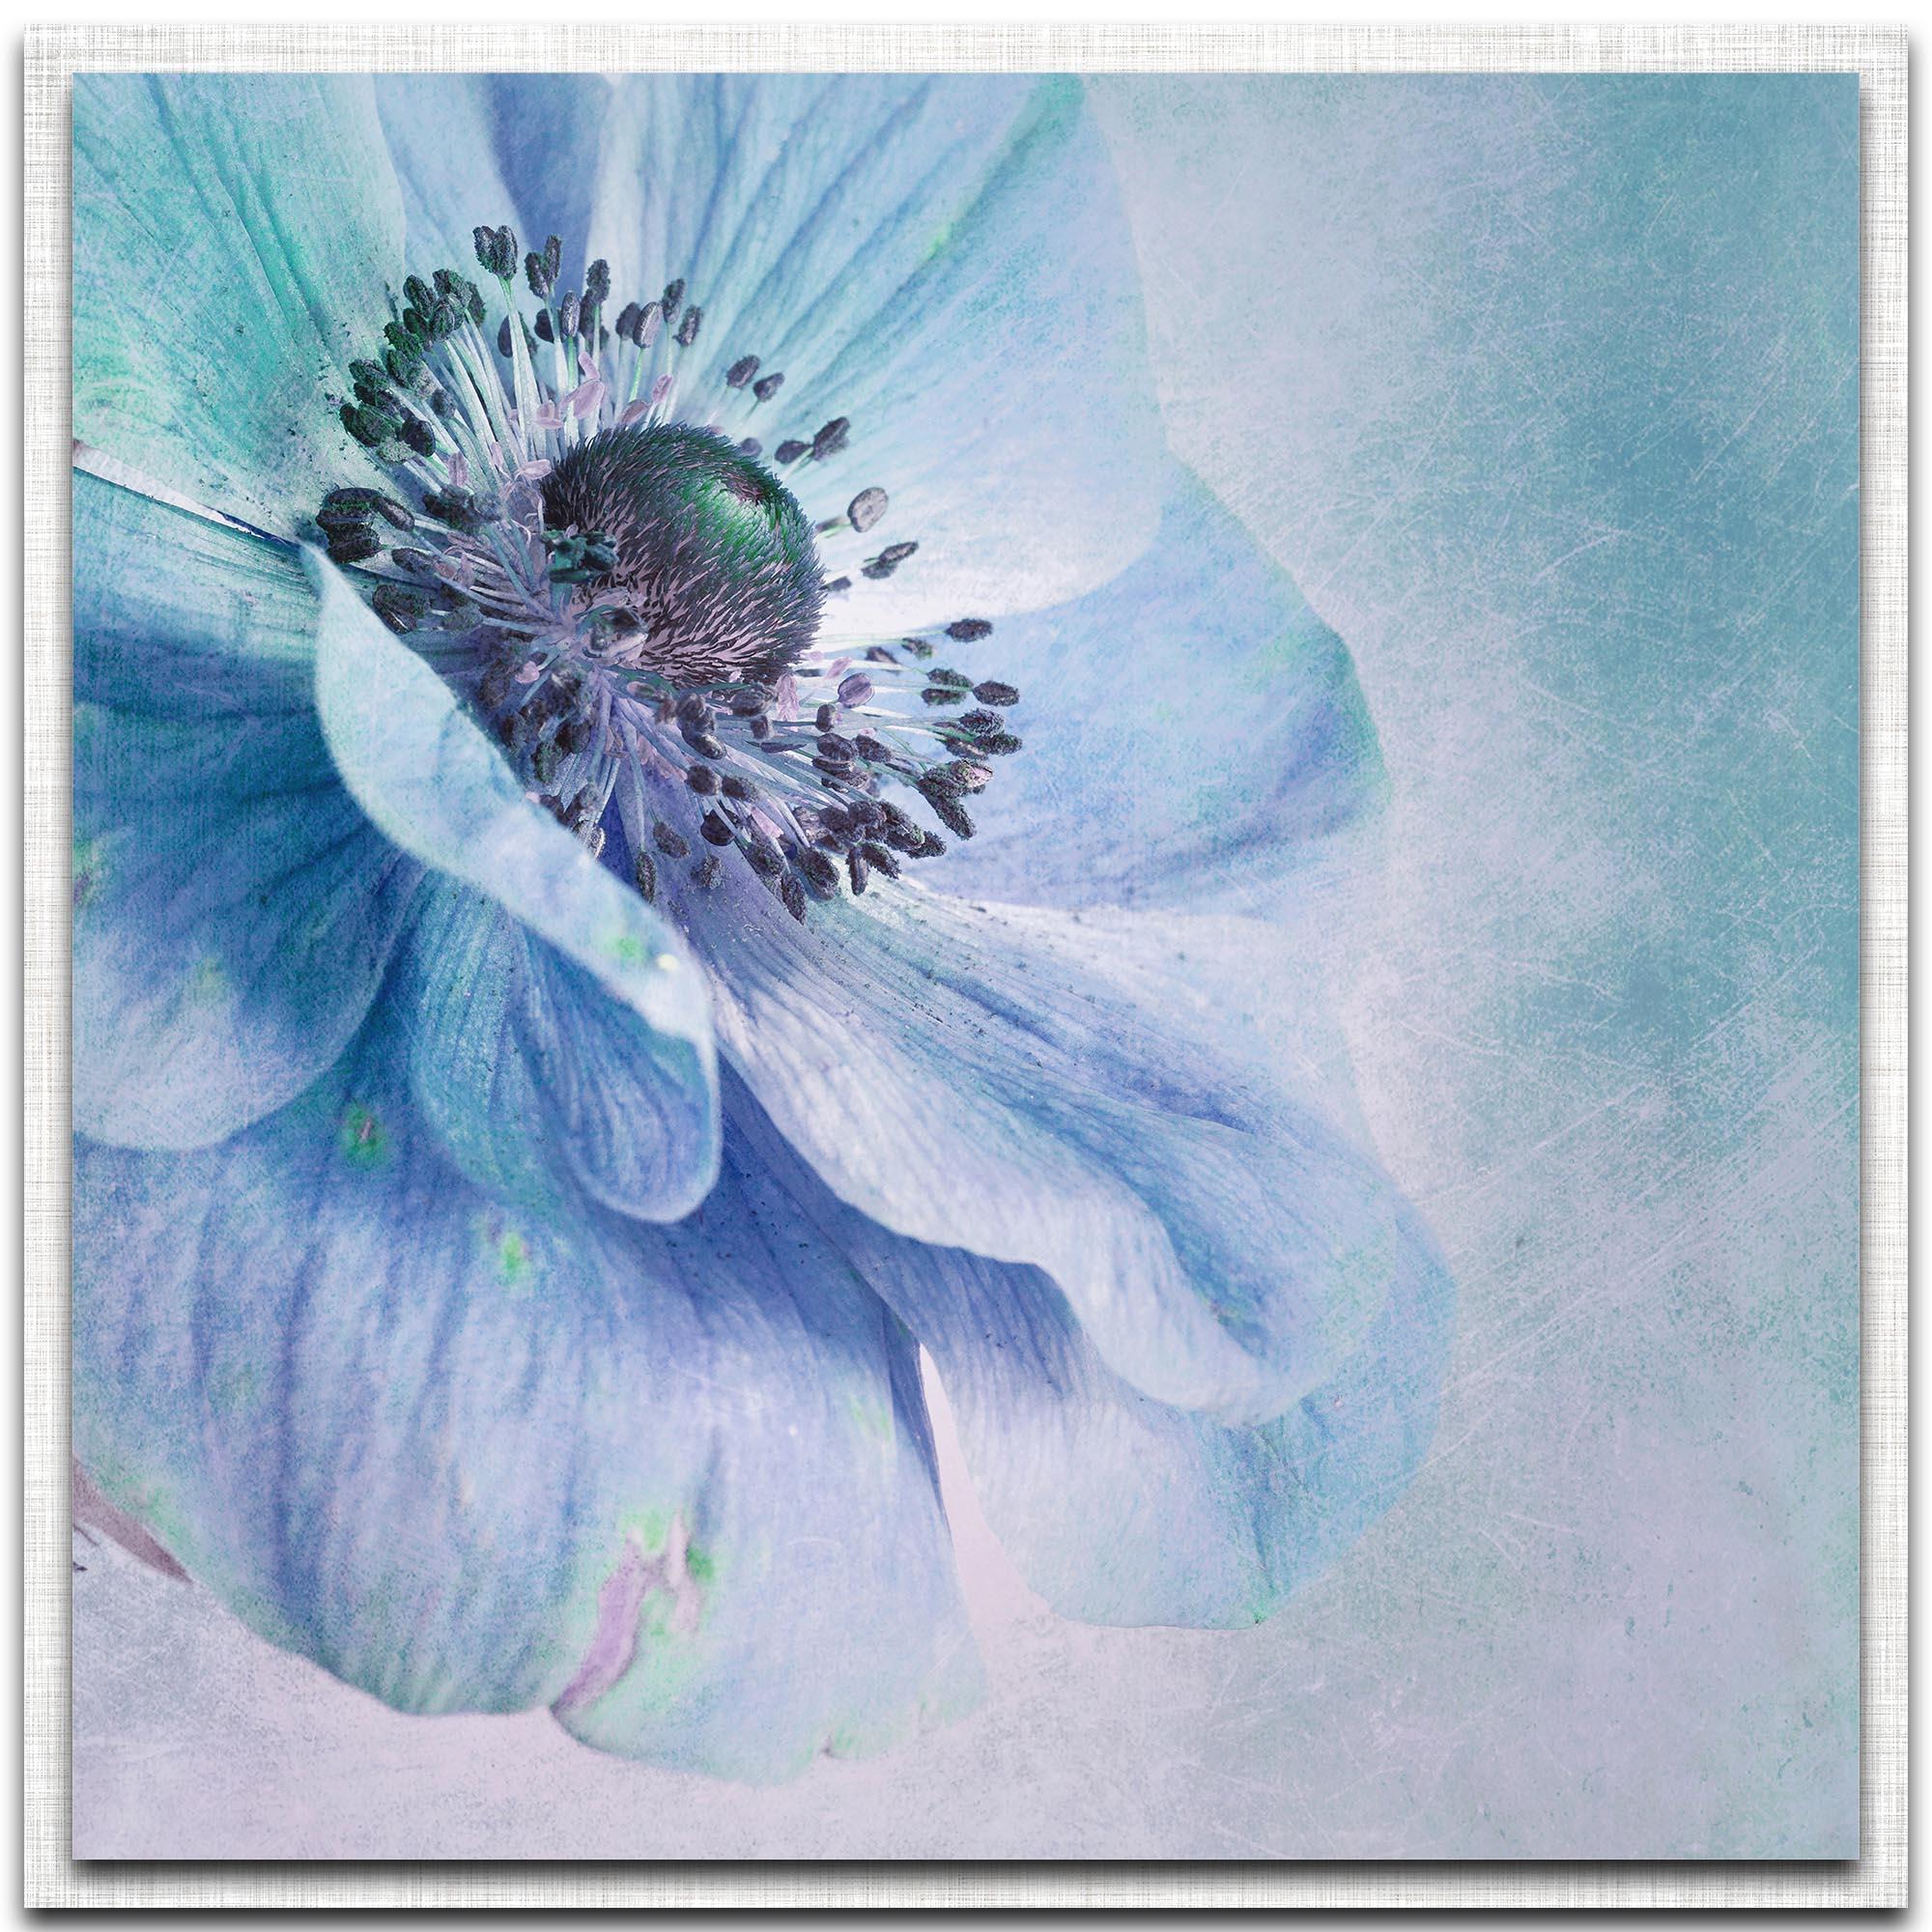 Priska Wettstein 'Shades of Blue' 22in x 22in Modern Farmhouse Floral on Metal